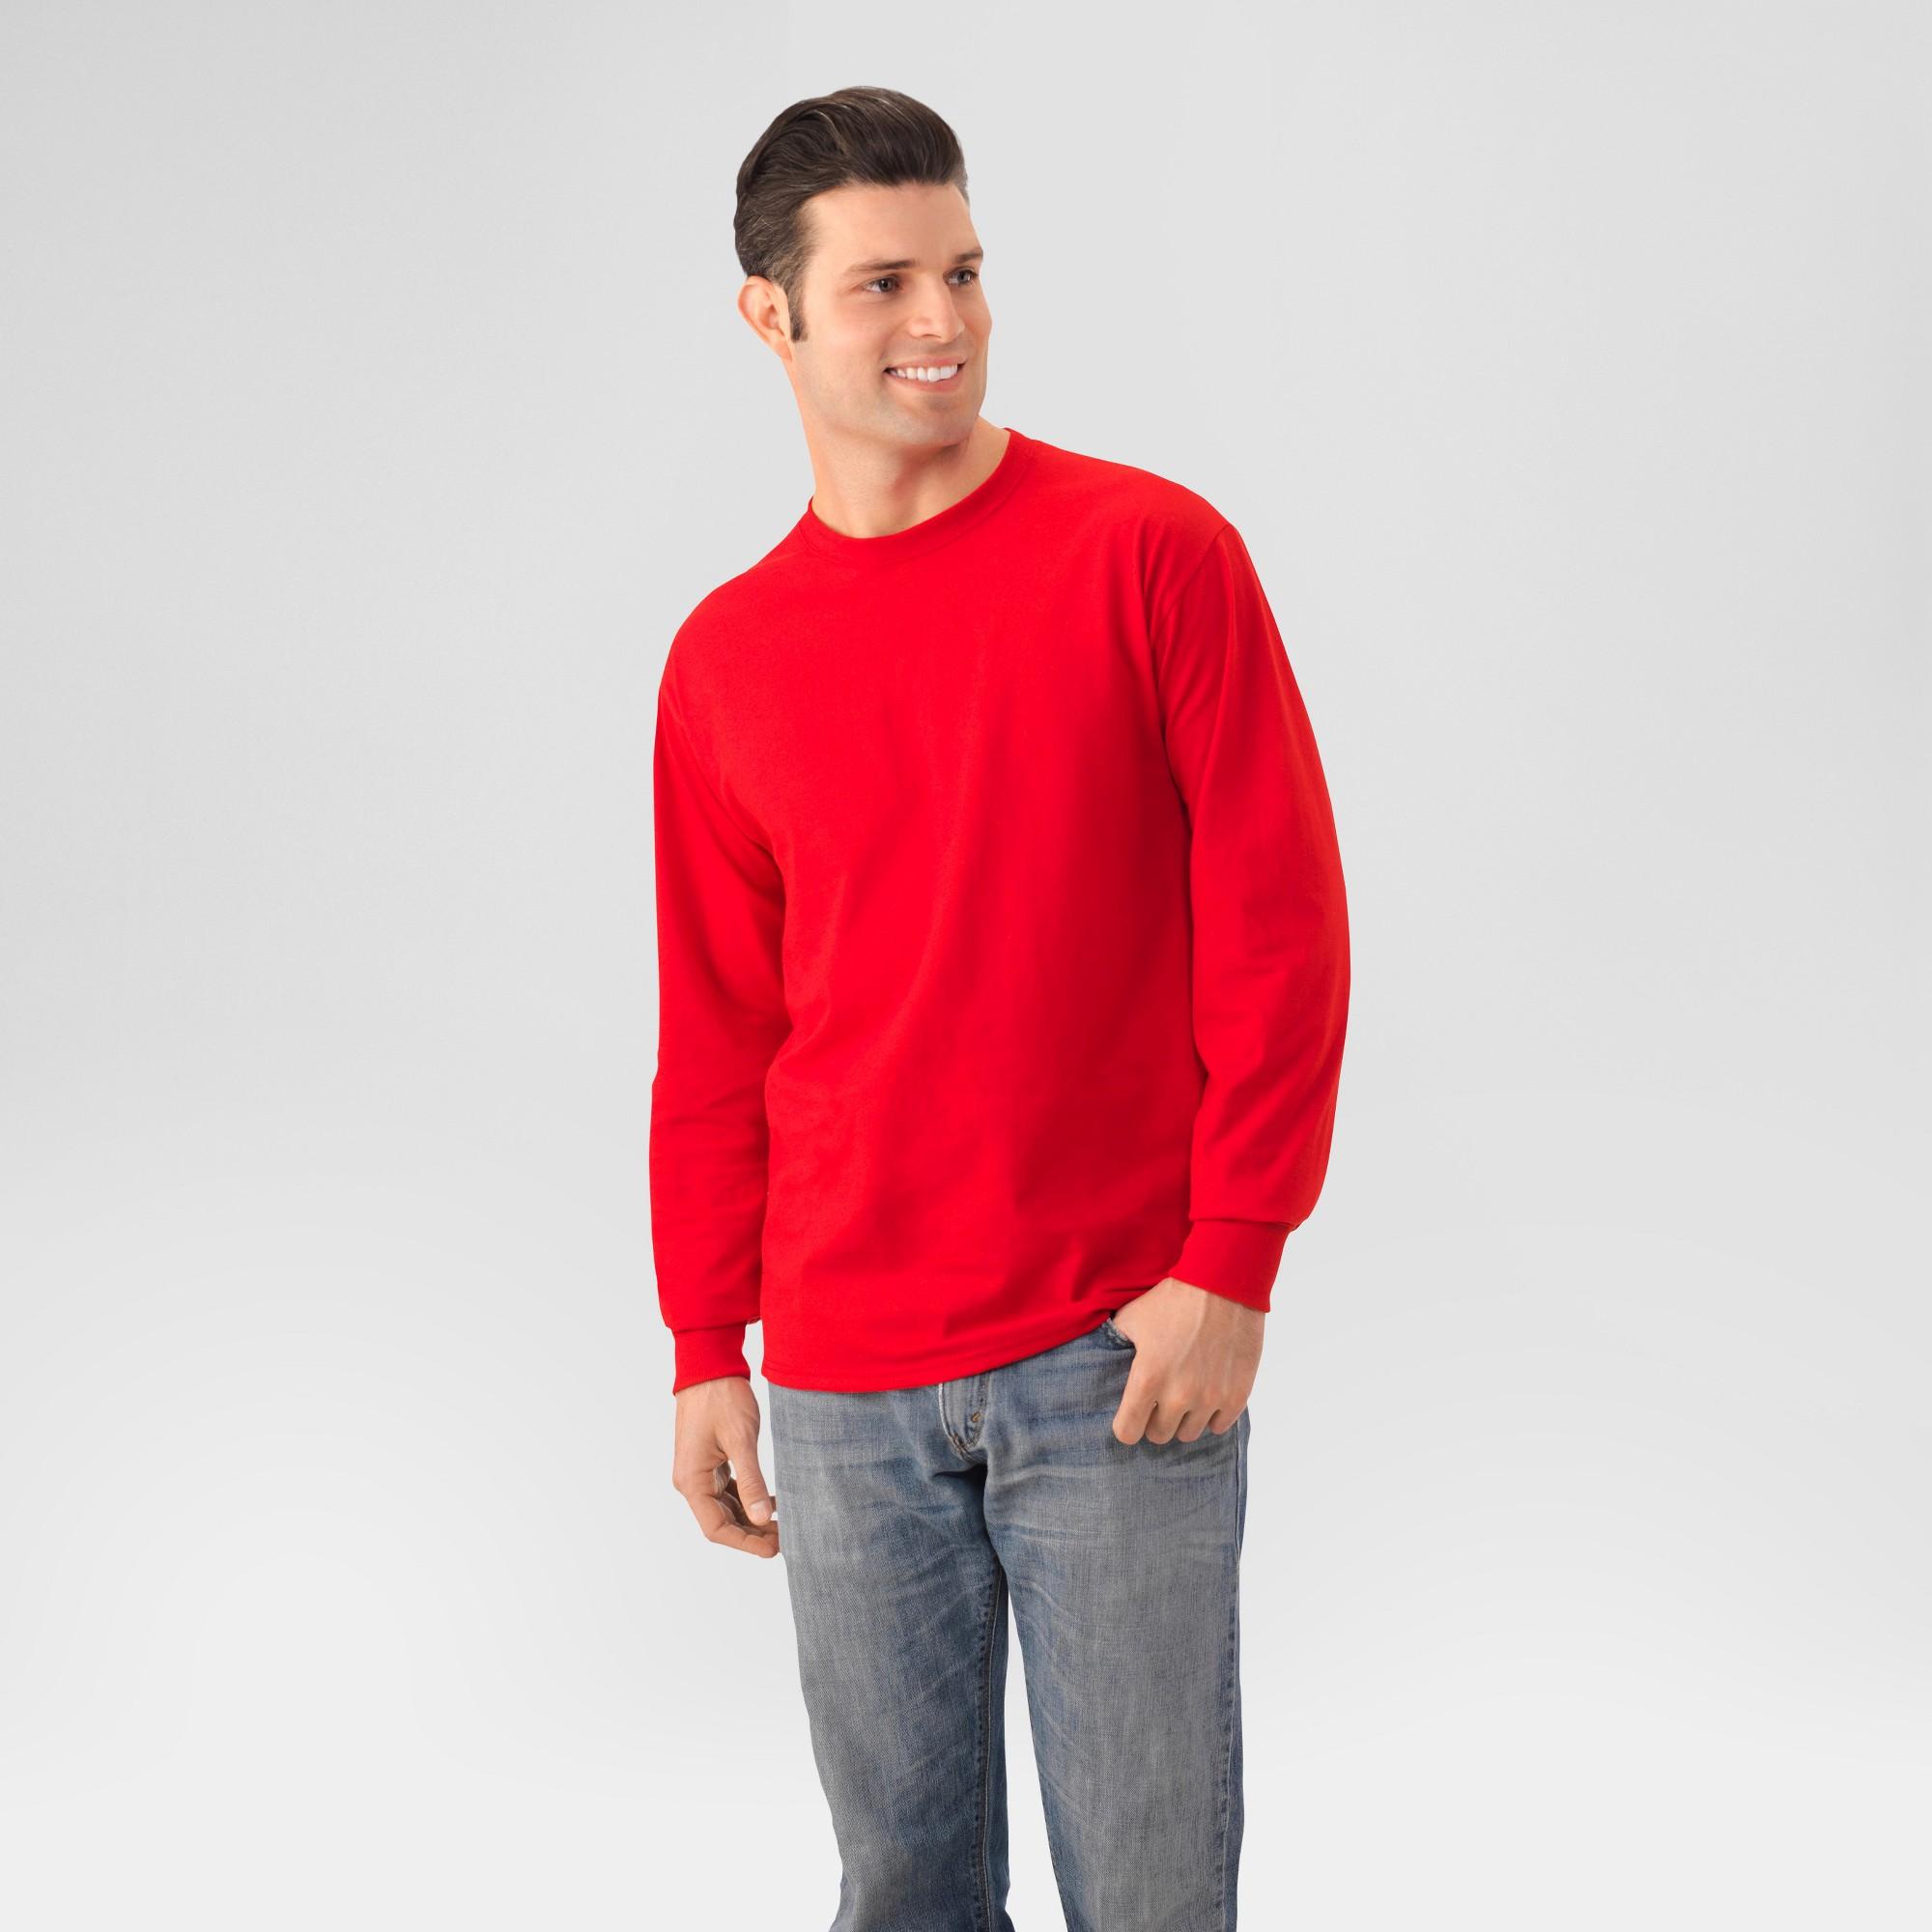 d59d57ca9fbb7 Fruit Of The Loom Men s Long Sleeve T-Shirt - True Red 2XL